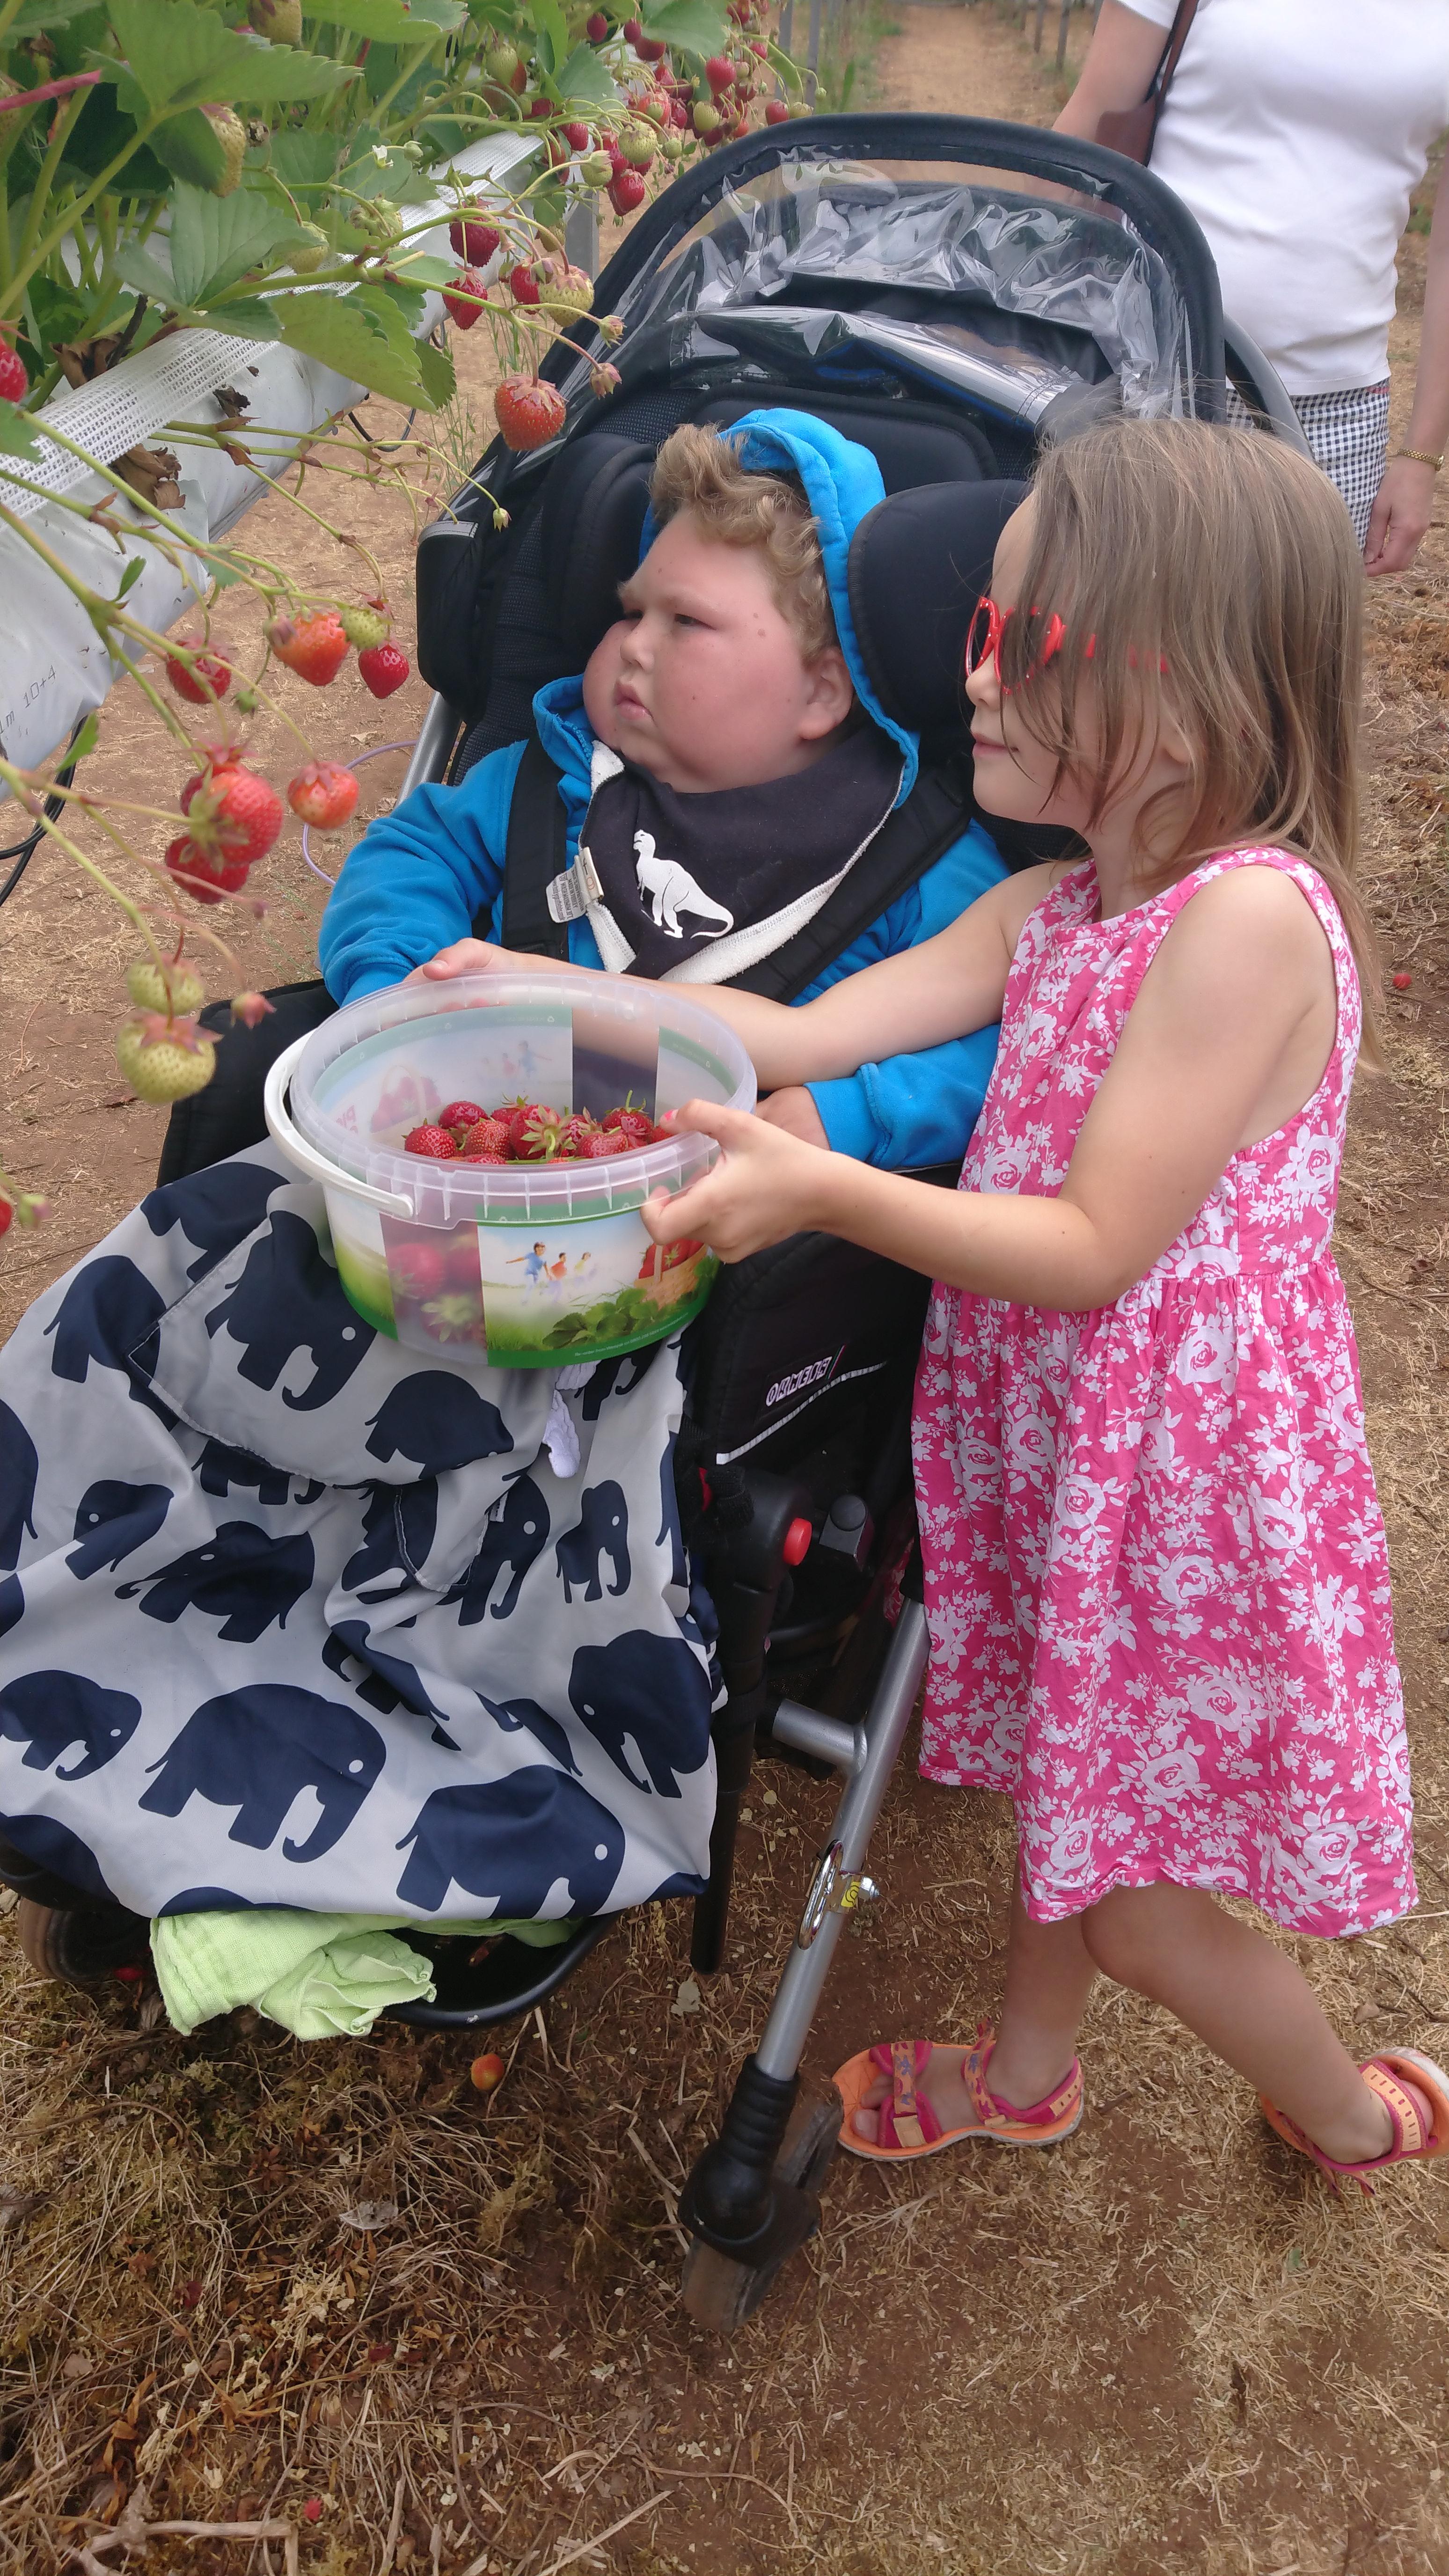 Benjamin and his sister picking strawberries